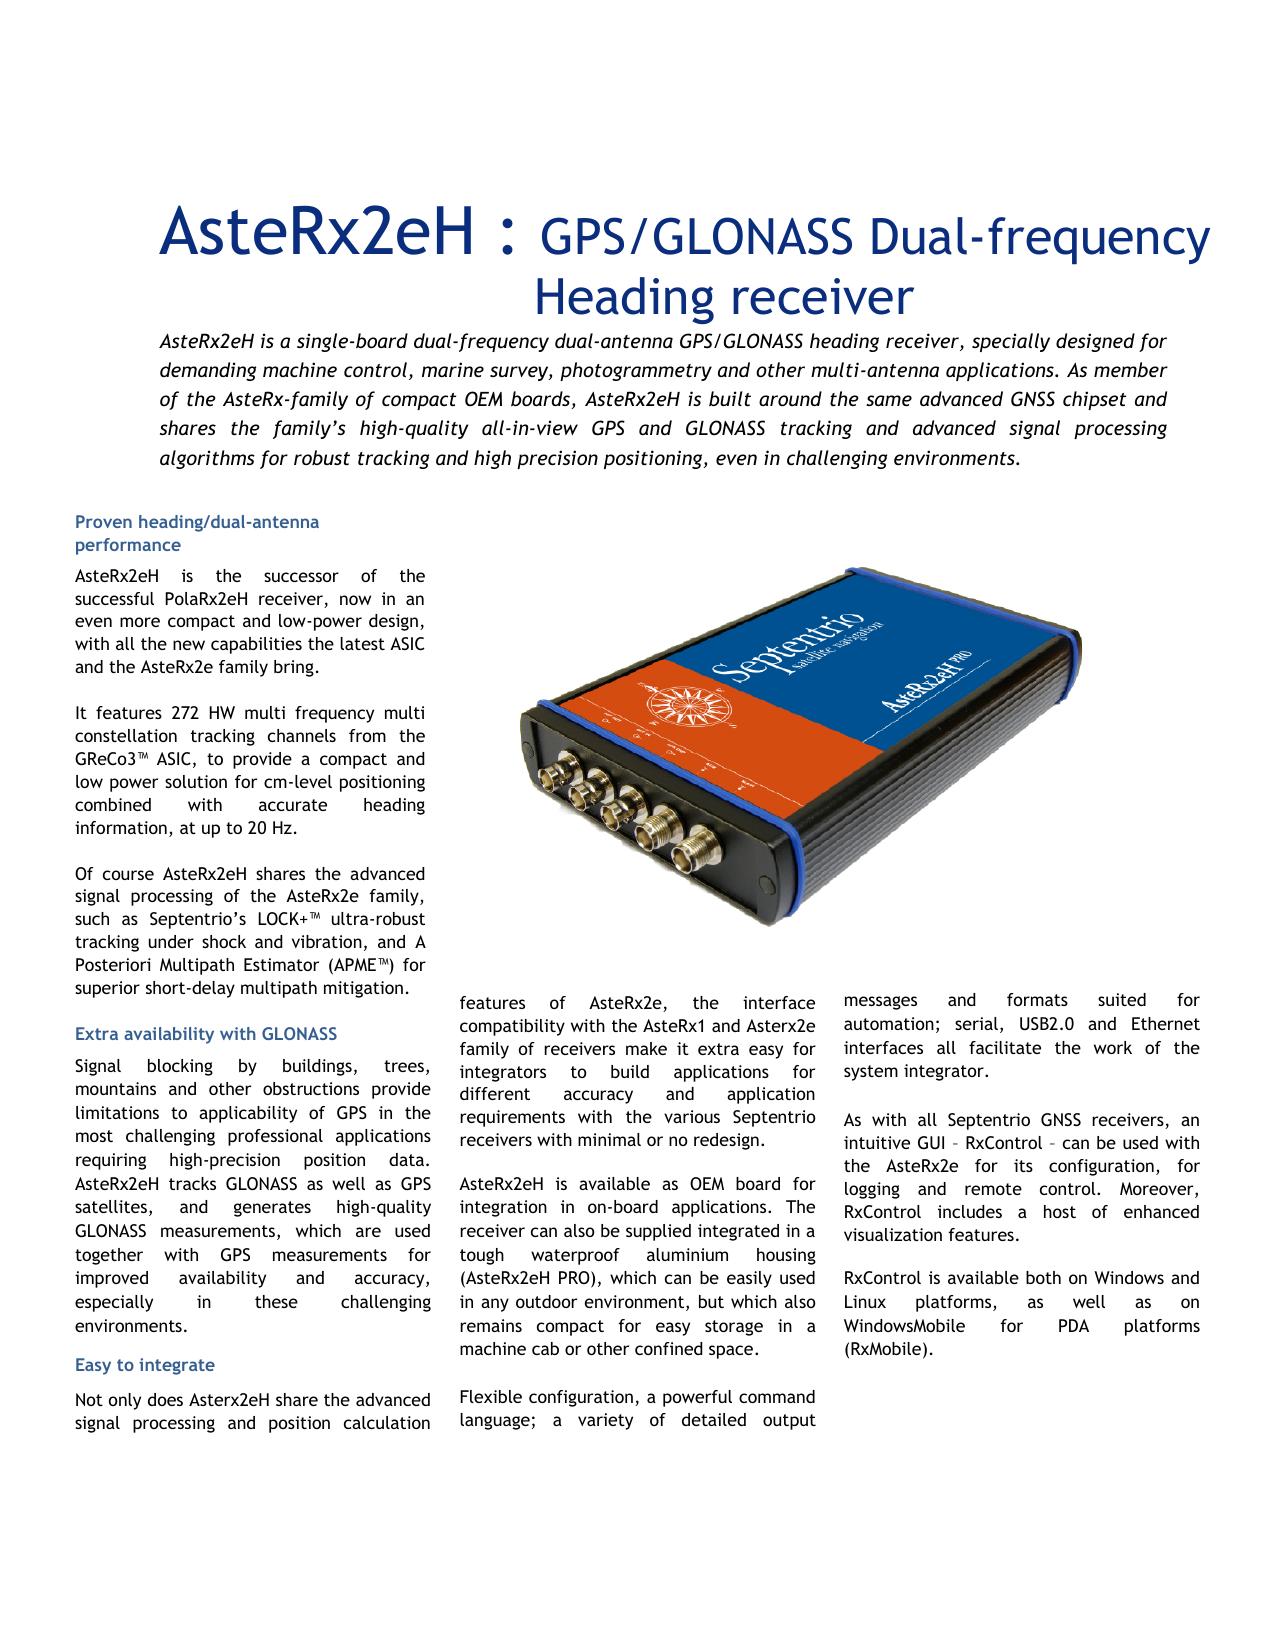 Glonass Frequency